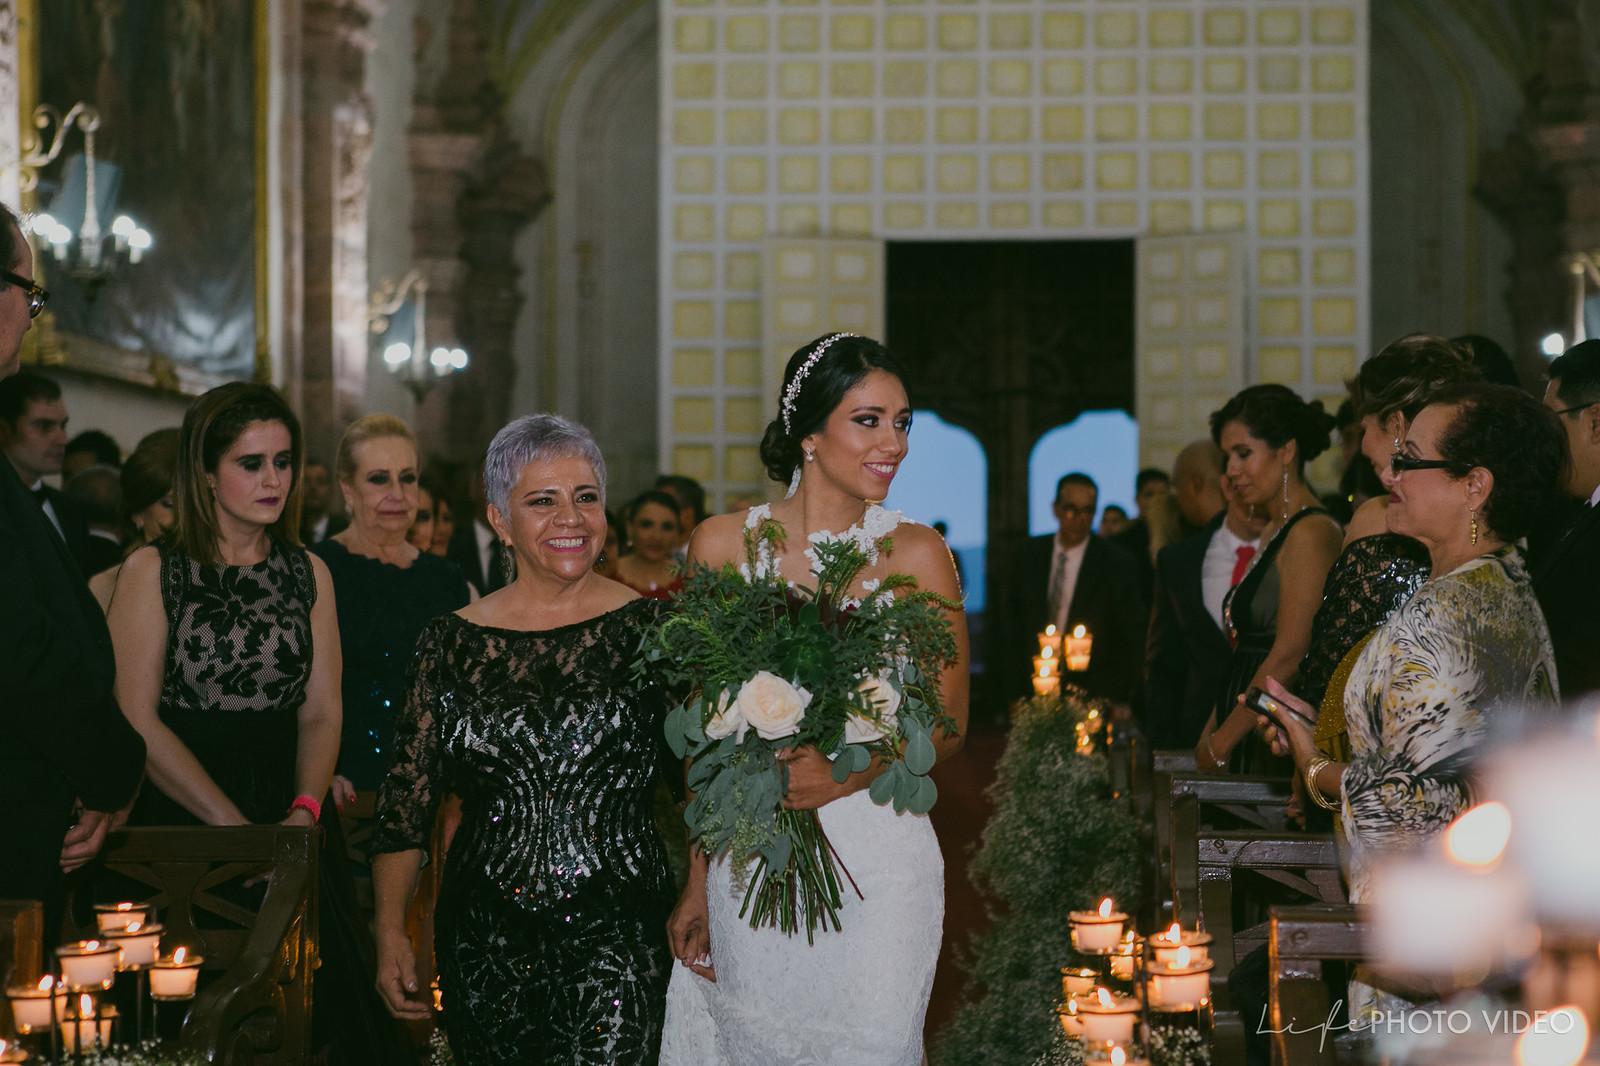 LifePhotoVideo_Boda_Guanajuato_Wedding_0033